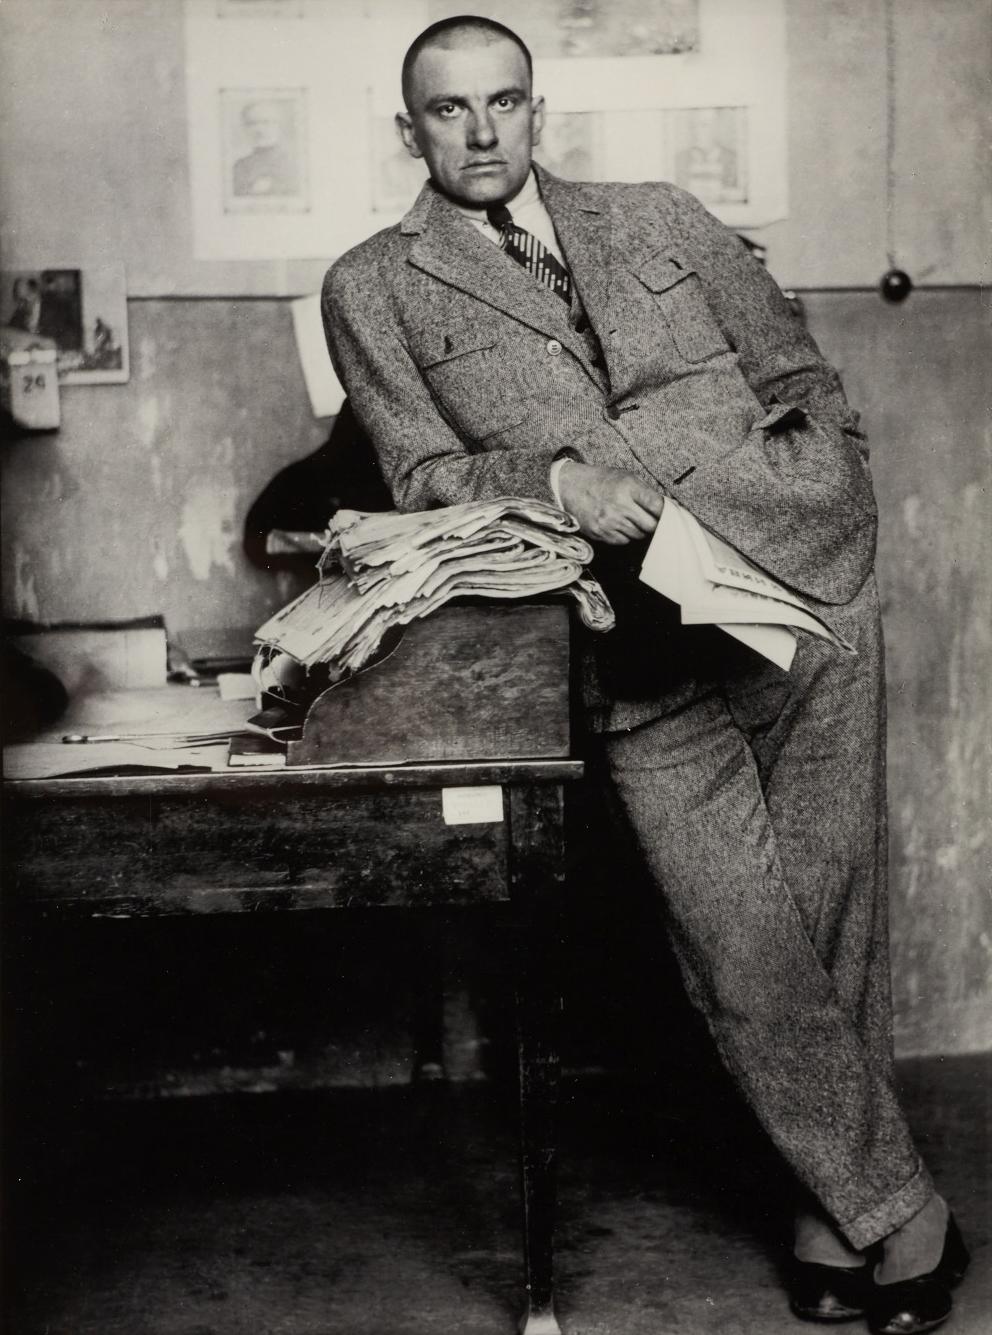 ALEXANDER RODCHENKO, Poet Vladimir Mayakovsky in Redaktion / in editorial office, Moscow 1927